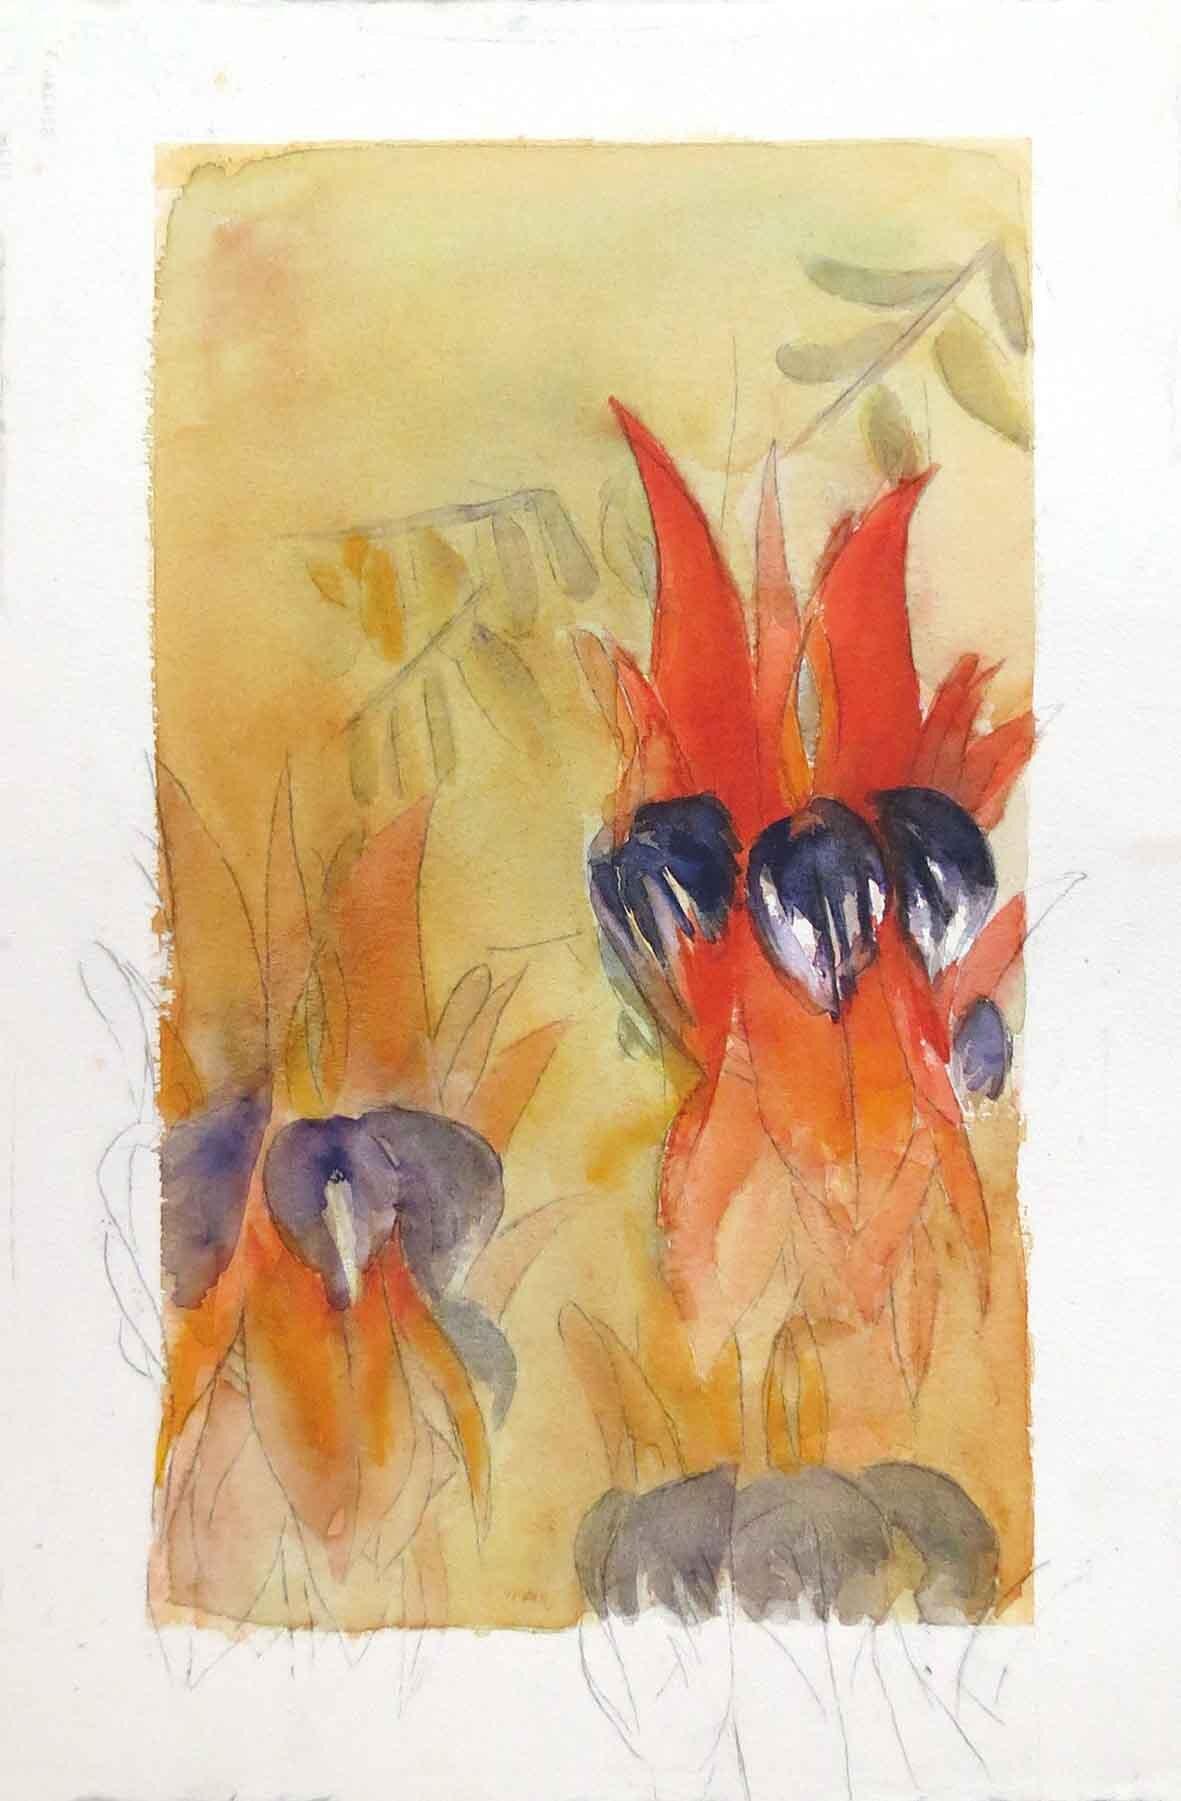 43. Deeva Muir, Marlukuru, 2019, watercolour on paper, 57 x 38 cm $325